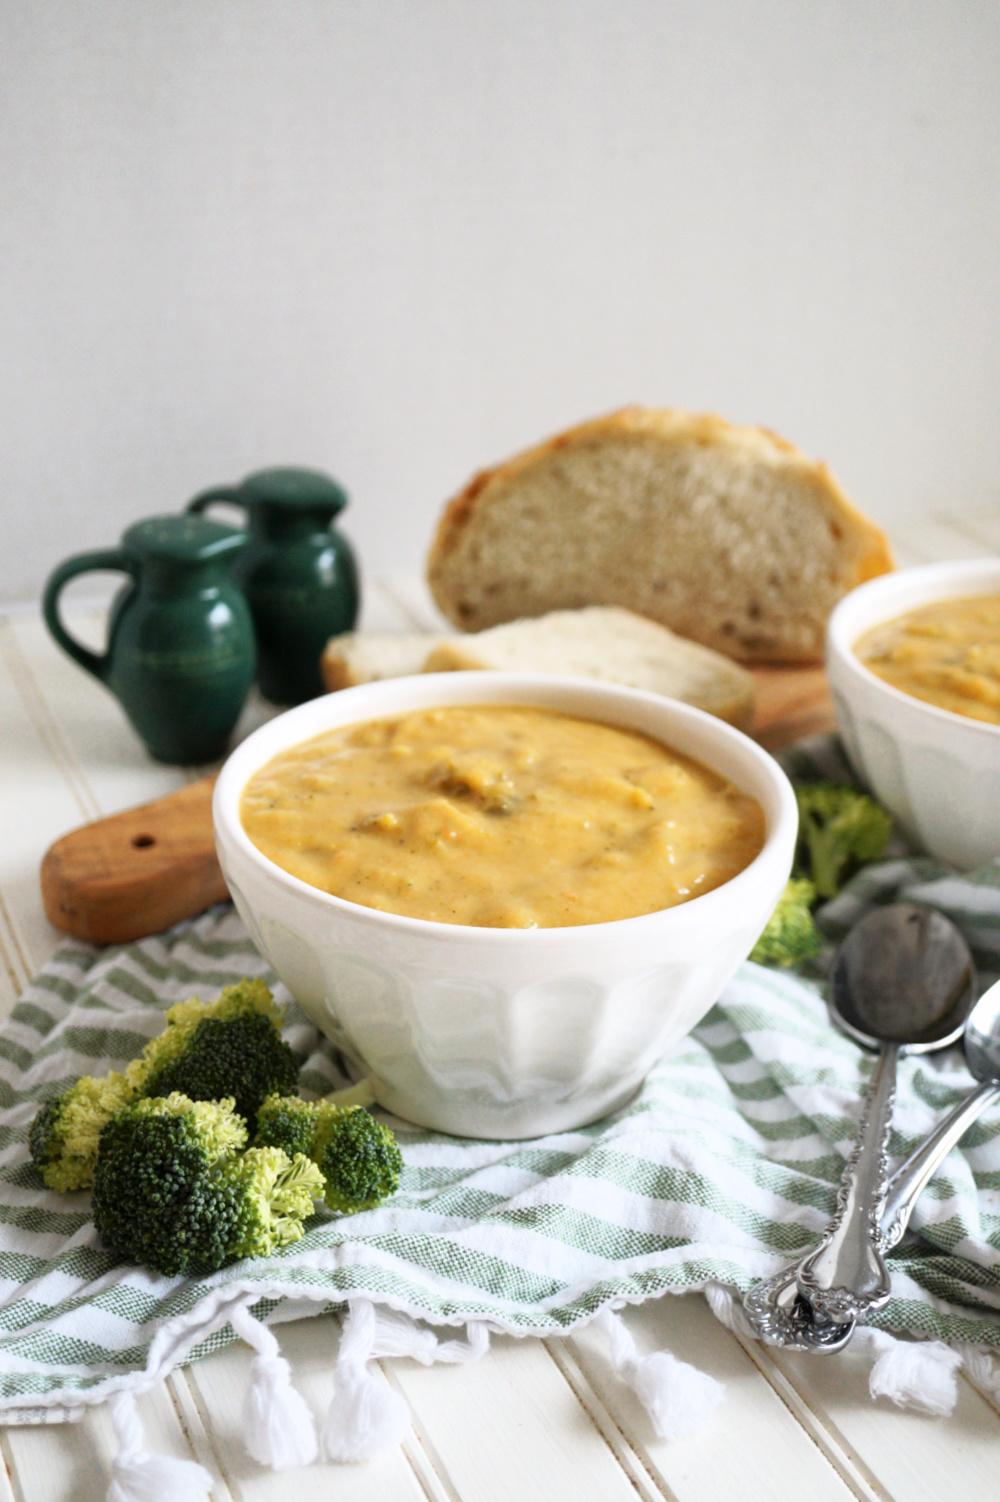 plain bowl of vegan broccoli cheese soup